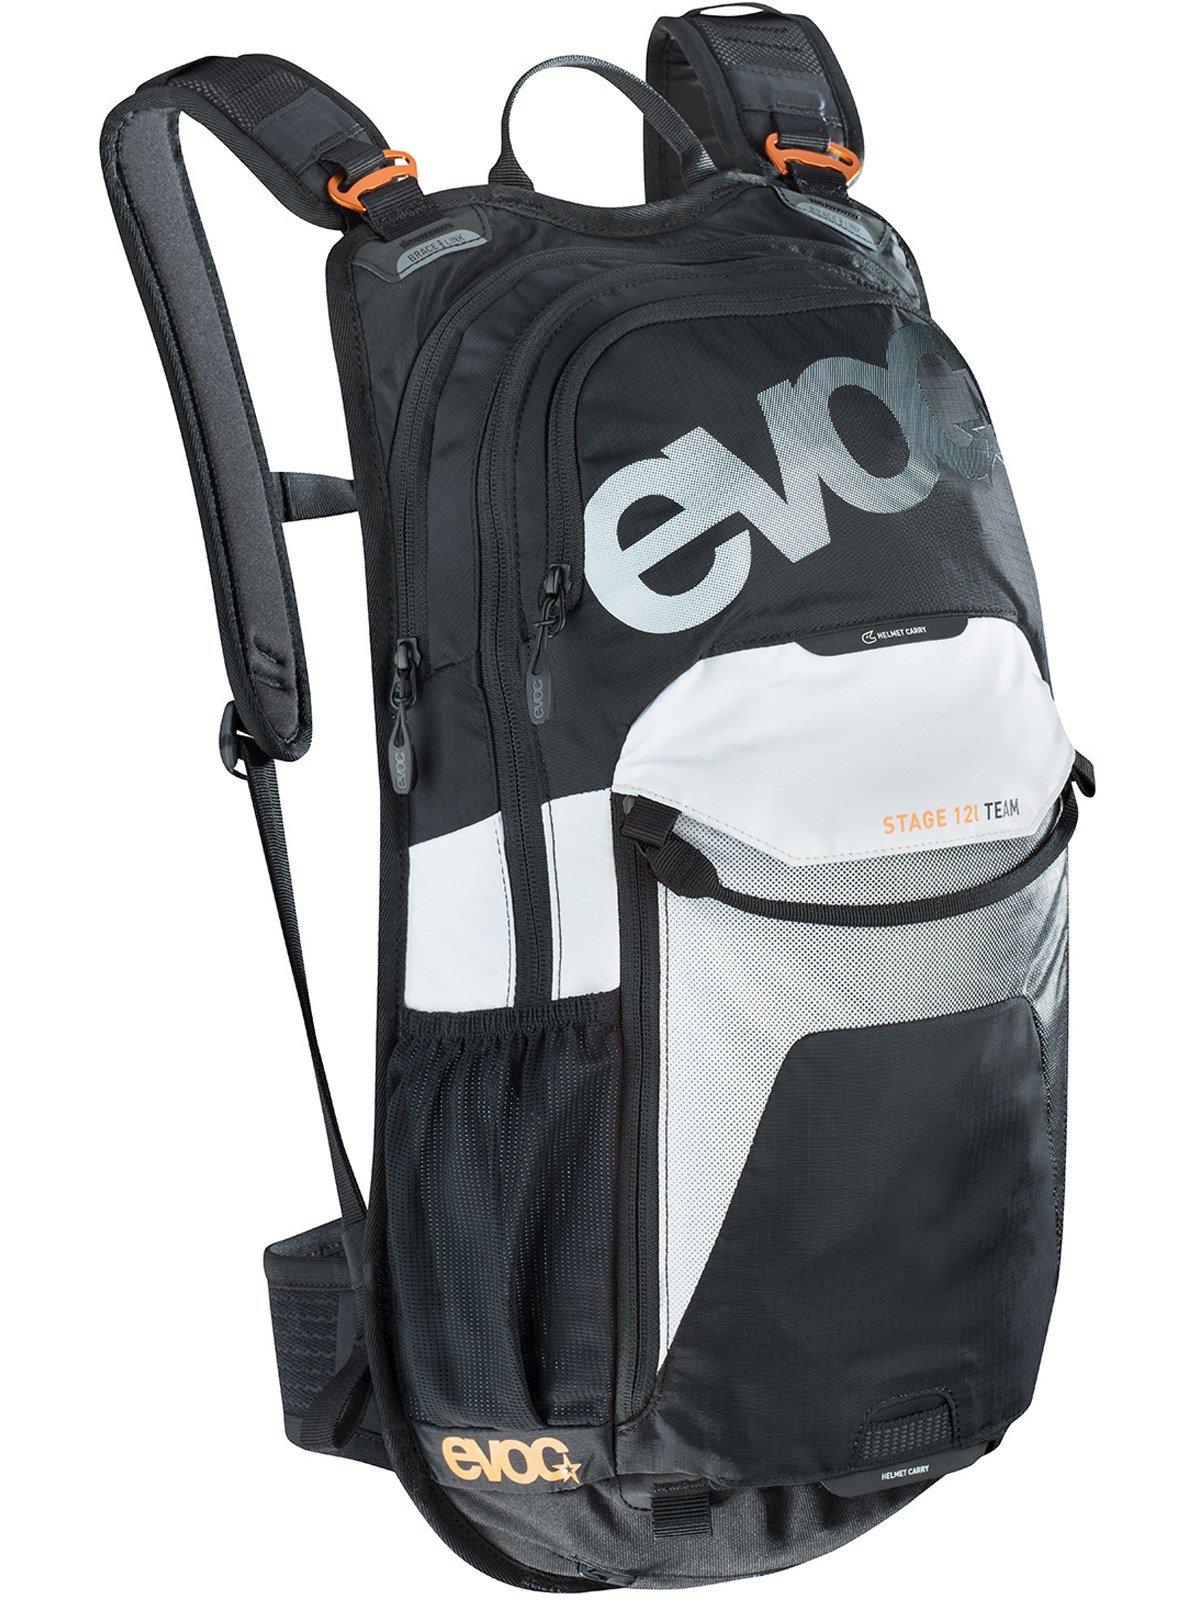 Evoc Black-White-Neon-Orange Stage Team - 12 Litre Hydration Pack Without Reserv (Default , Black)